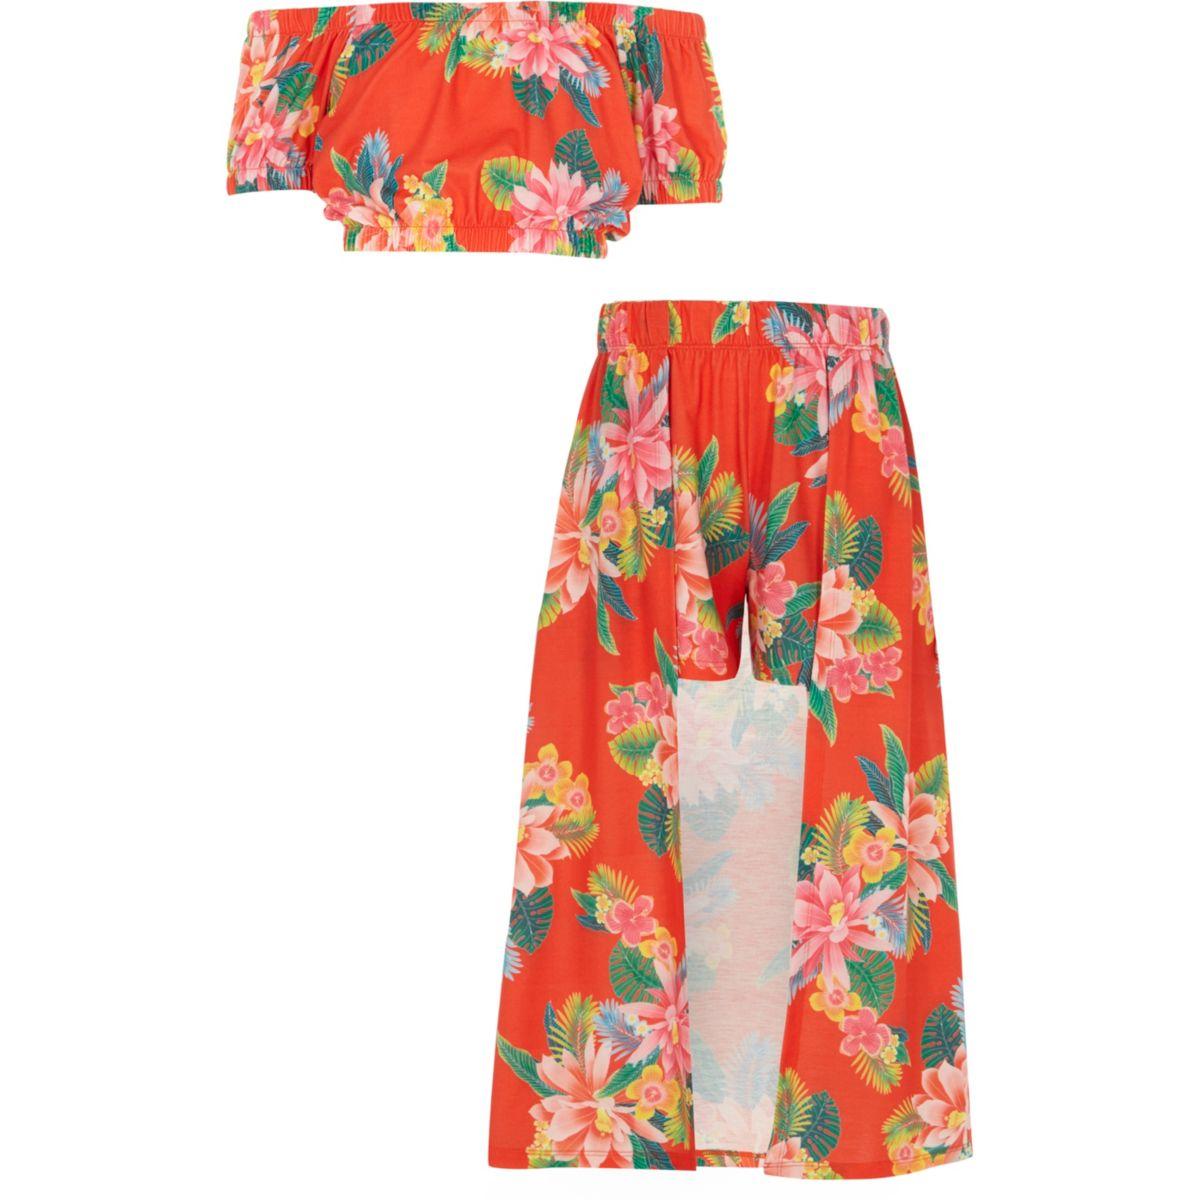 Girls tropical print skort outfit